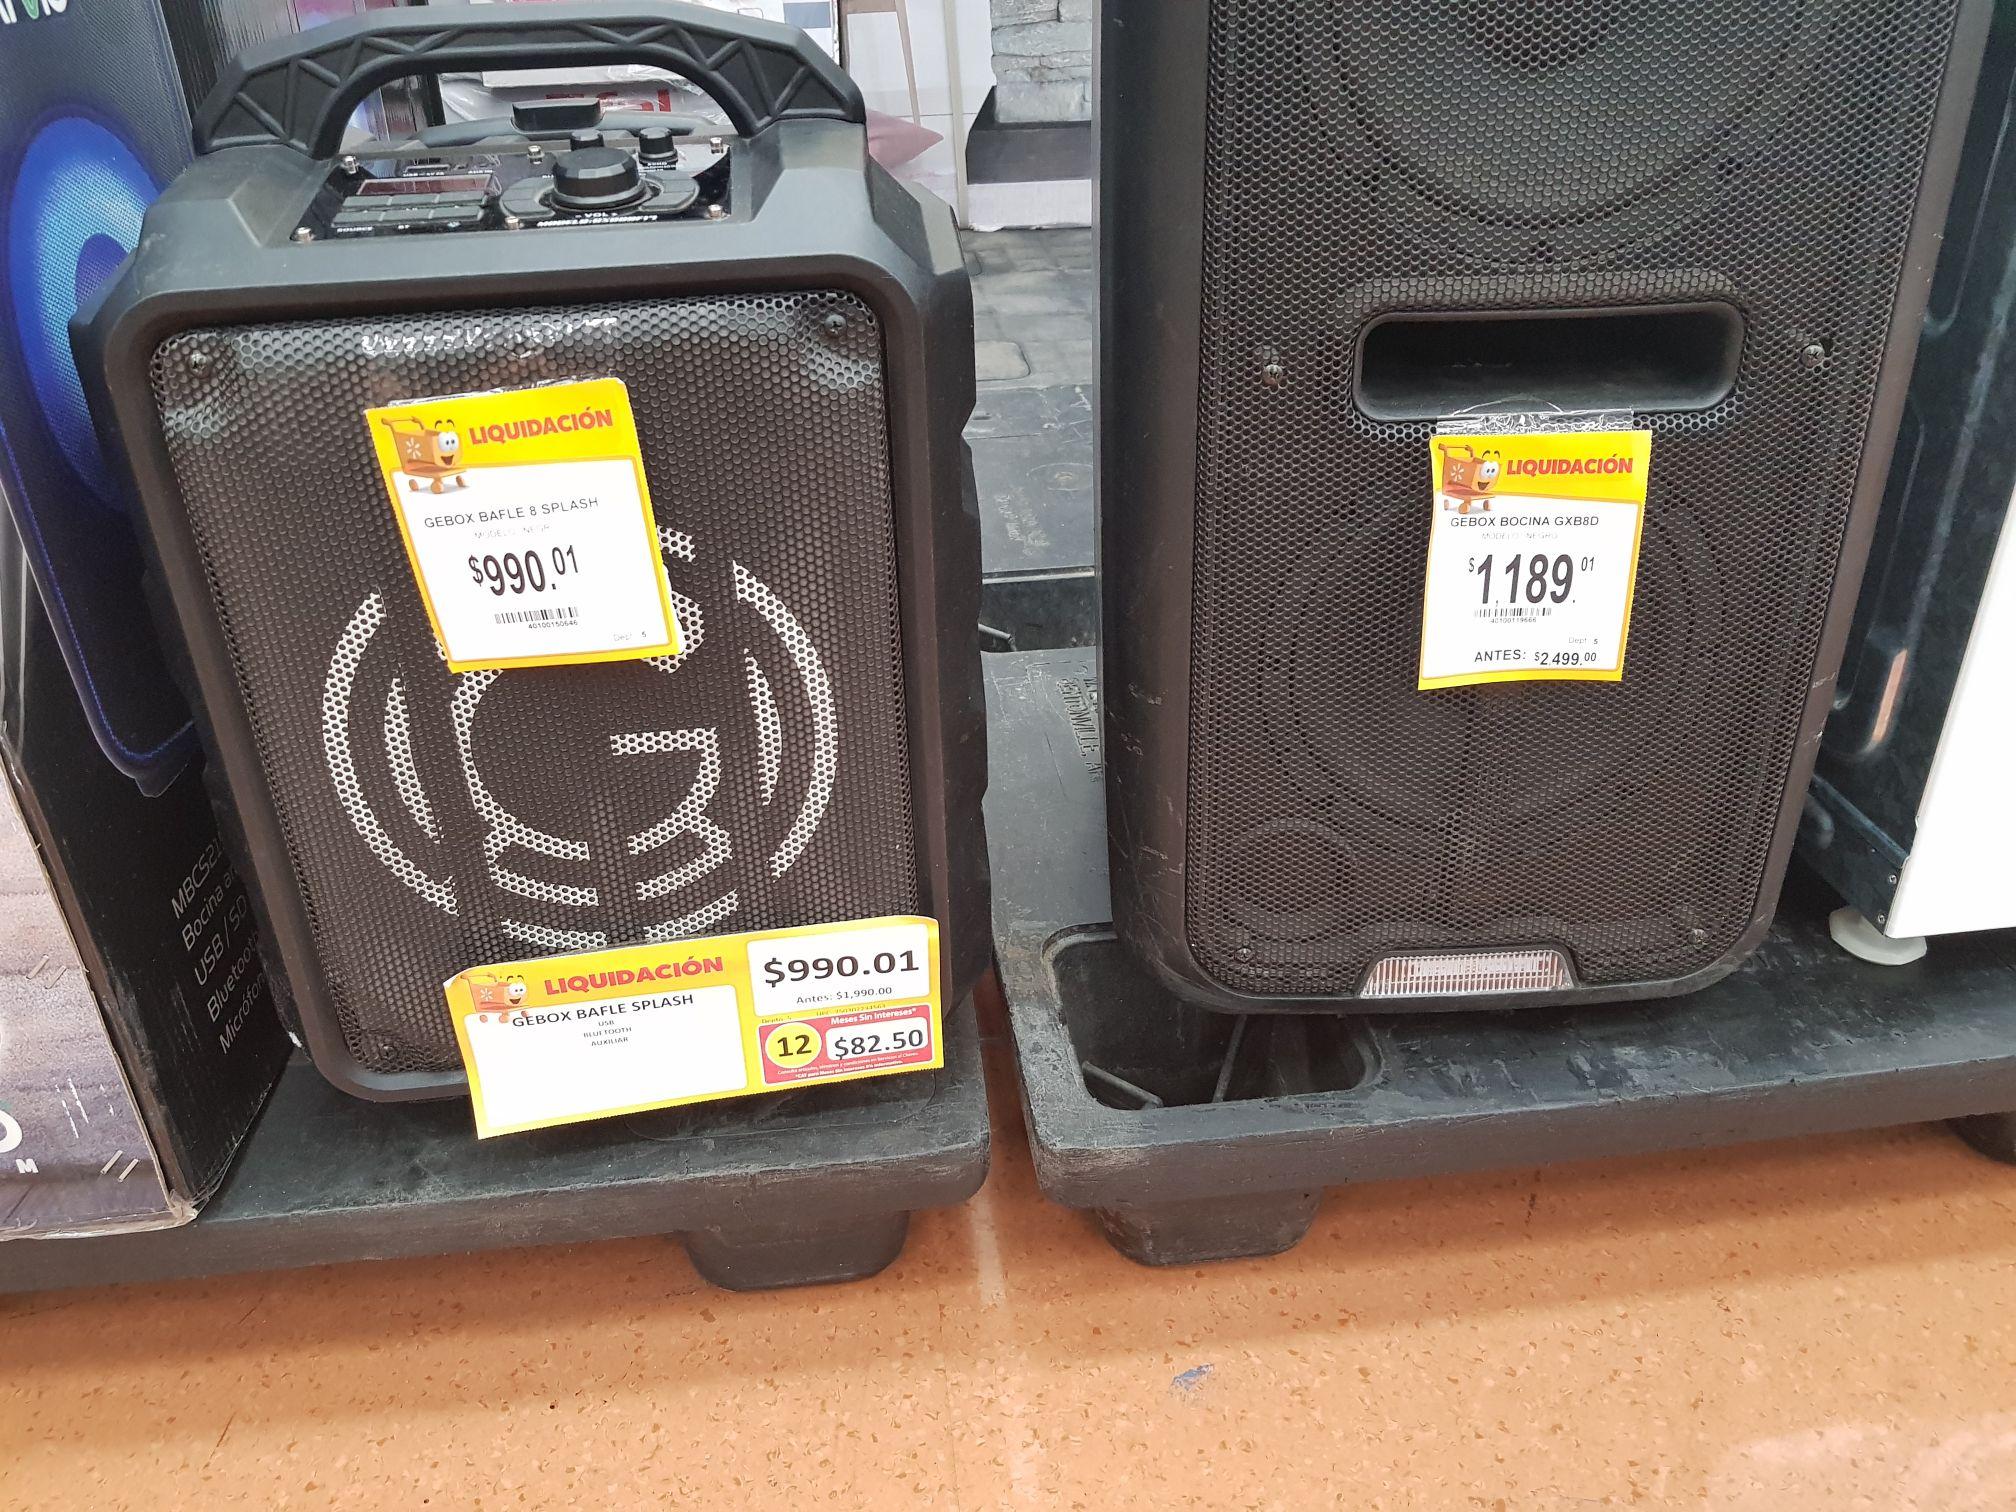 Walmart: Gebox bocina GXB8D